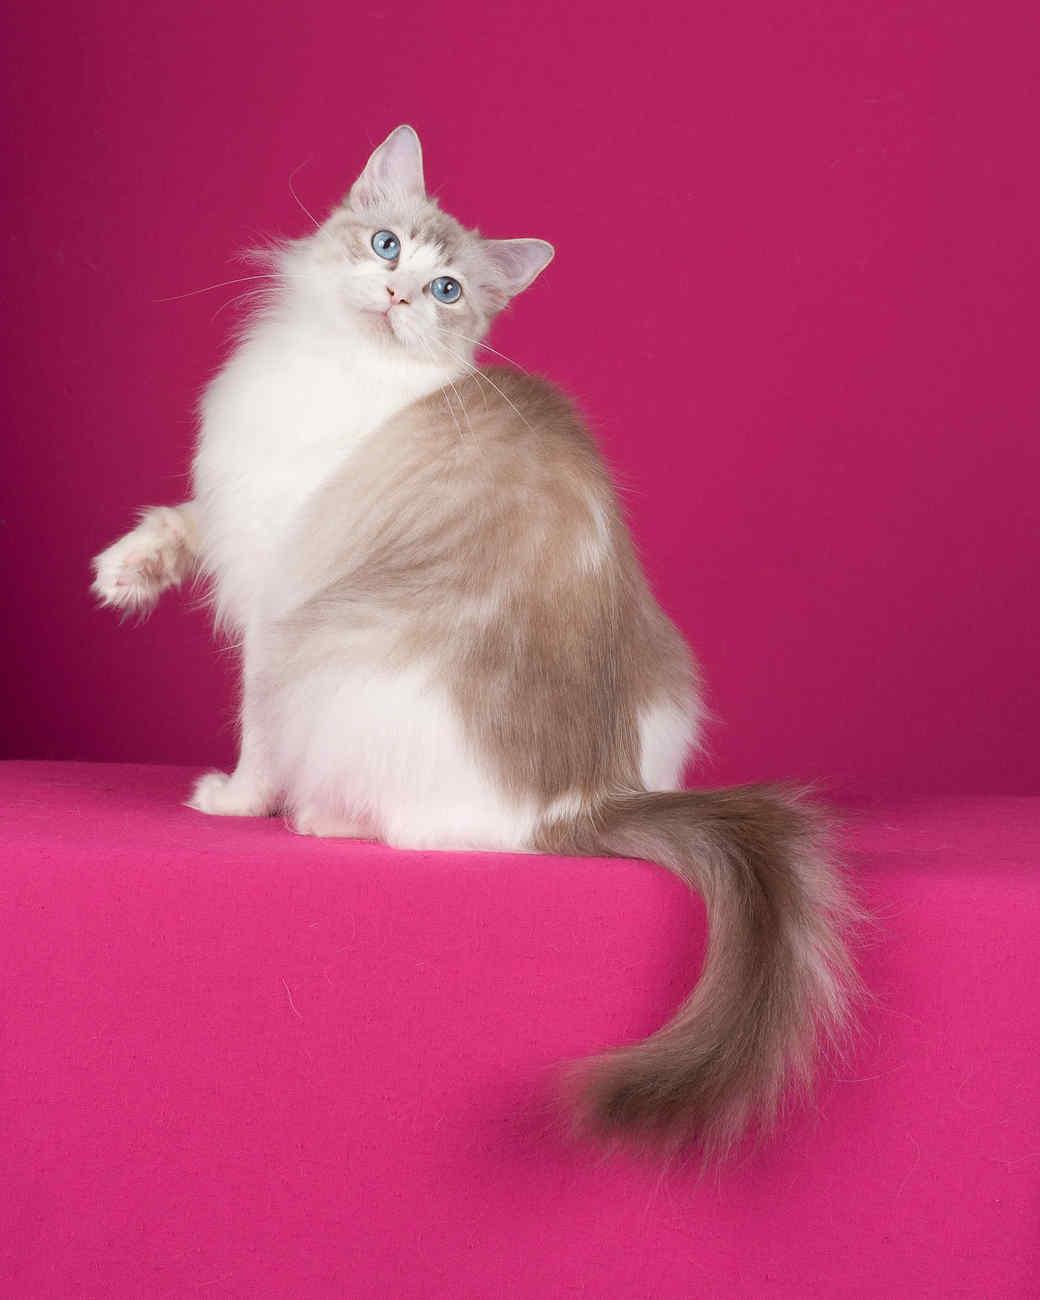 cat-breeds-ragdoll-ih27-435.jpg